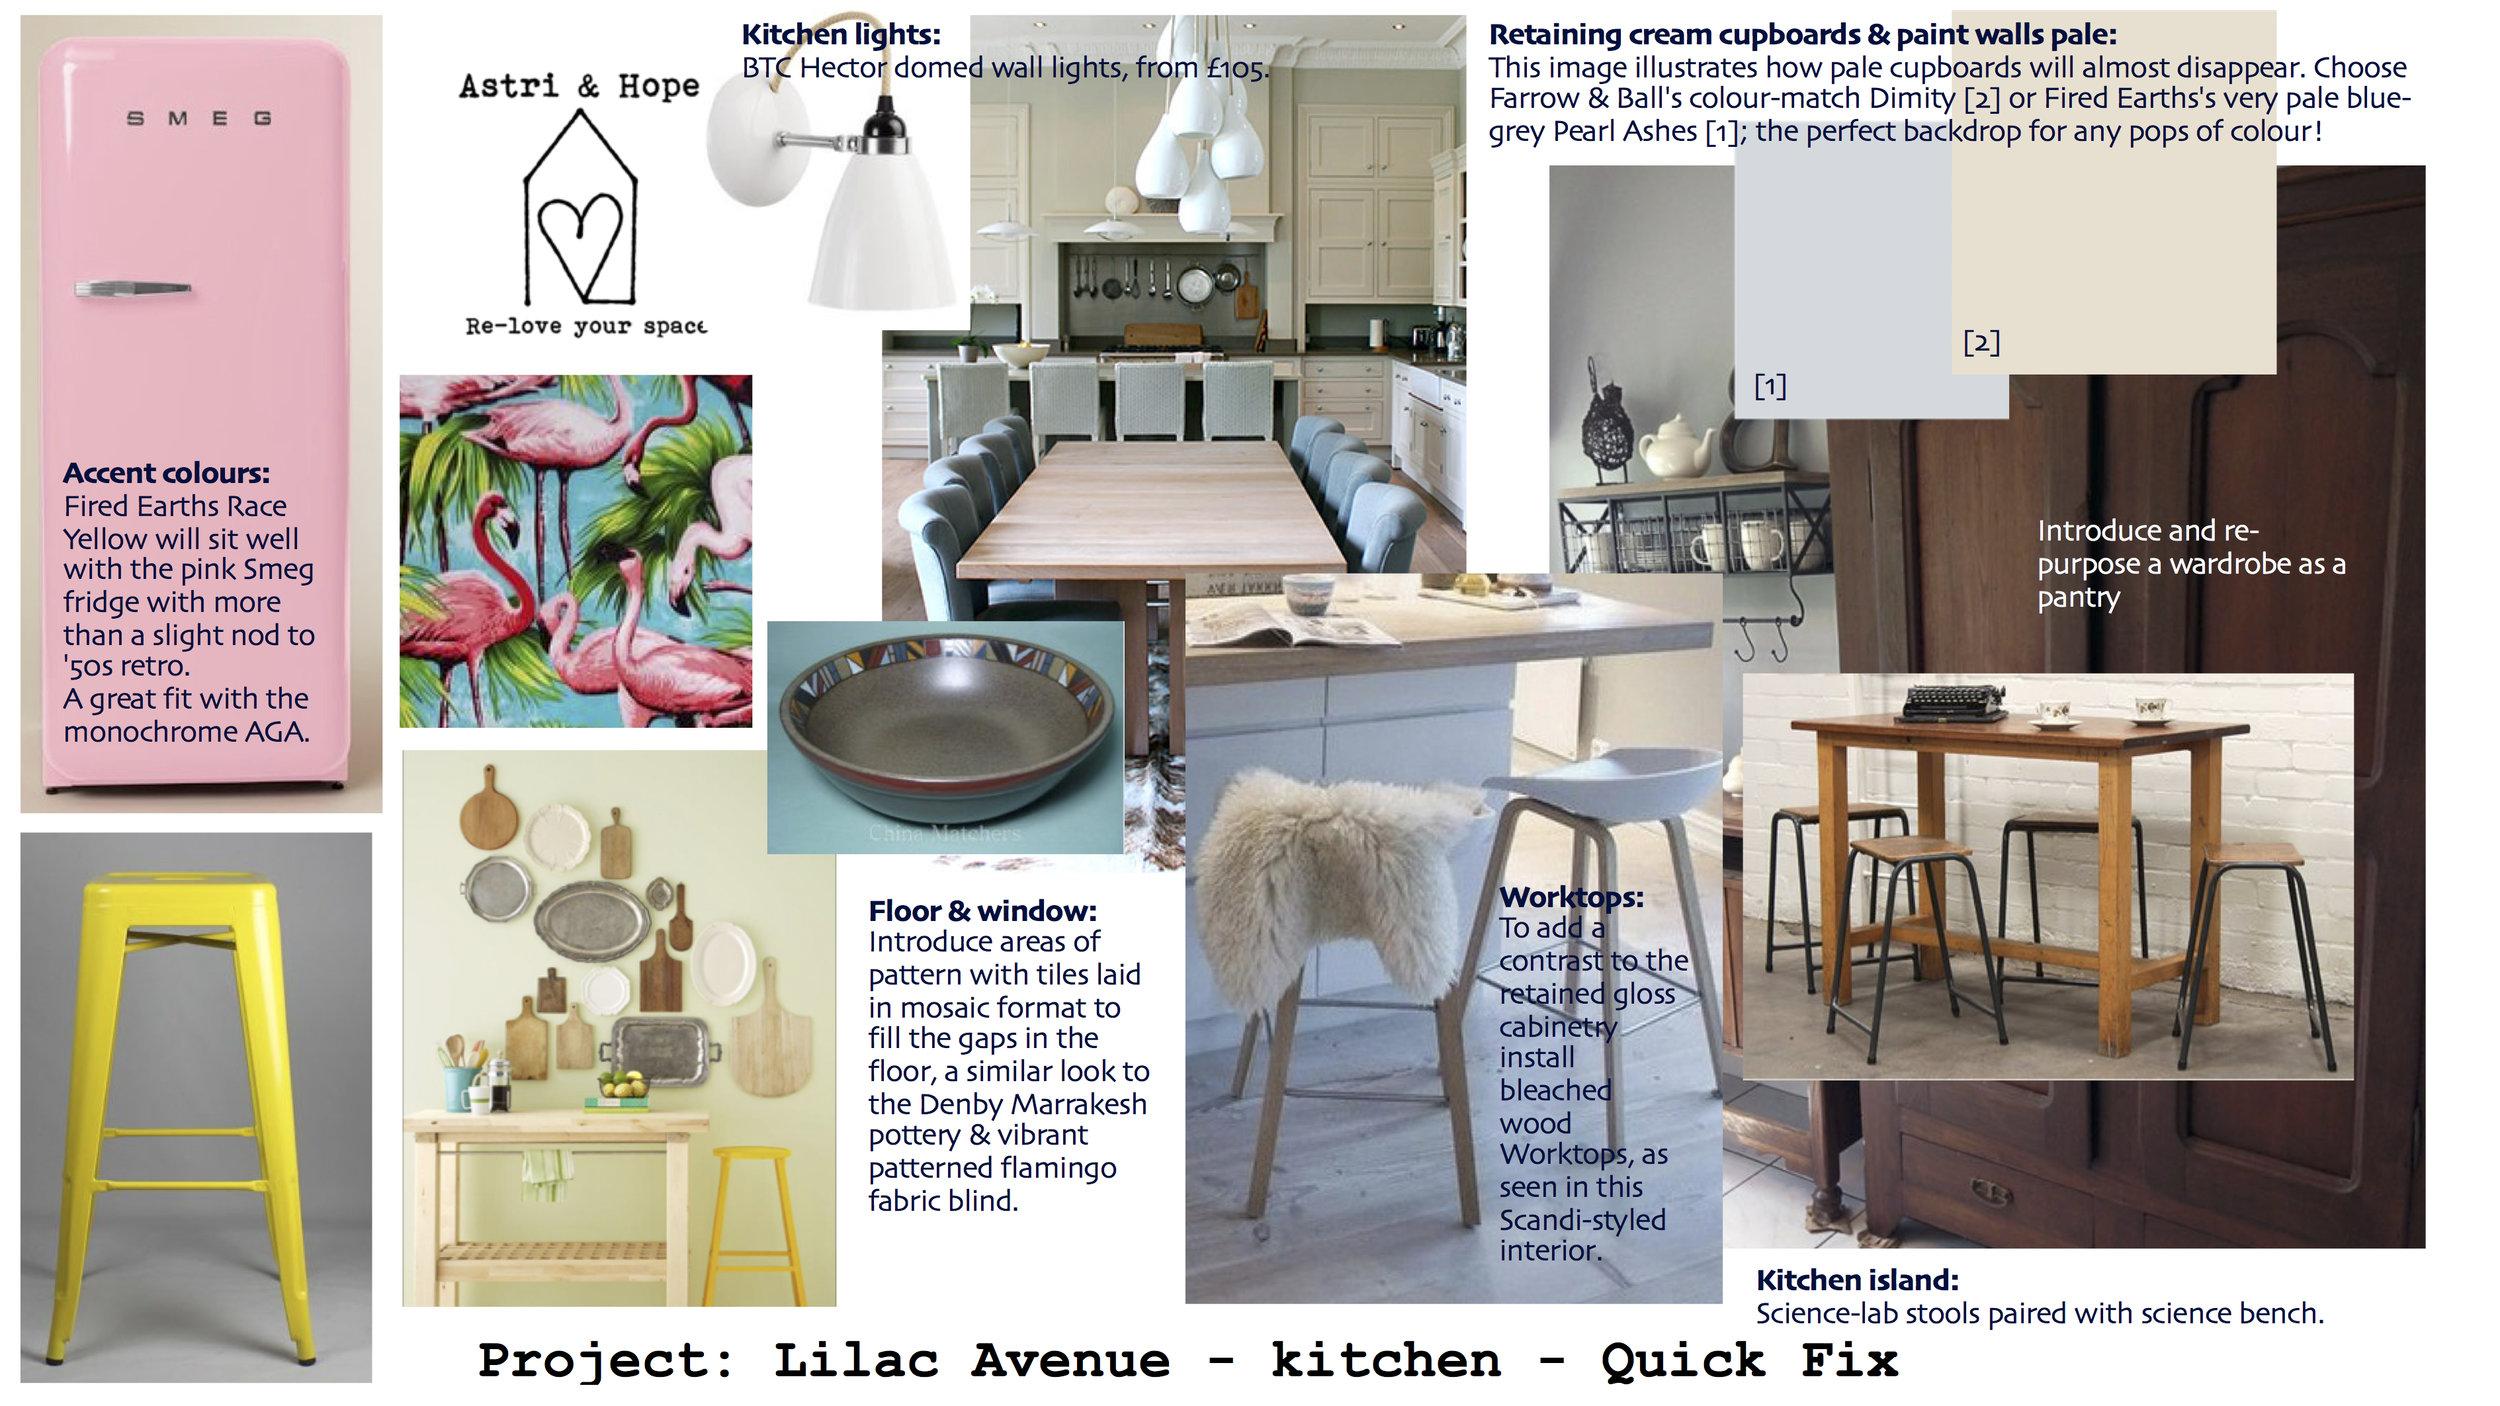 JPGLilac Avenue, kitchen.jpg